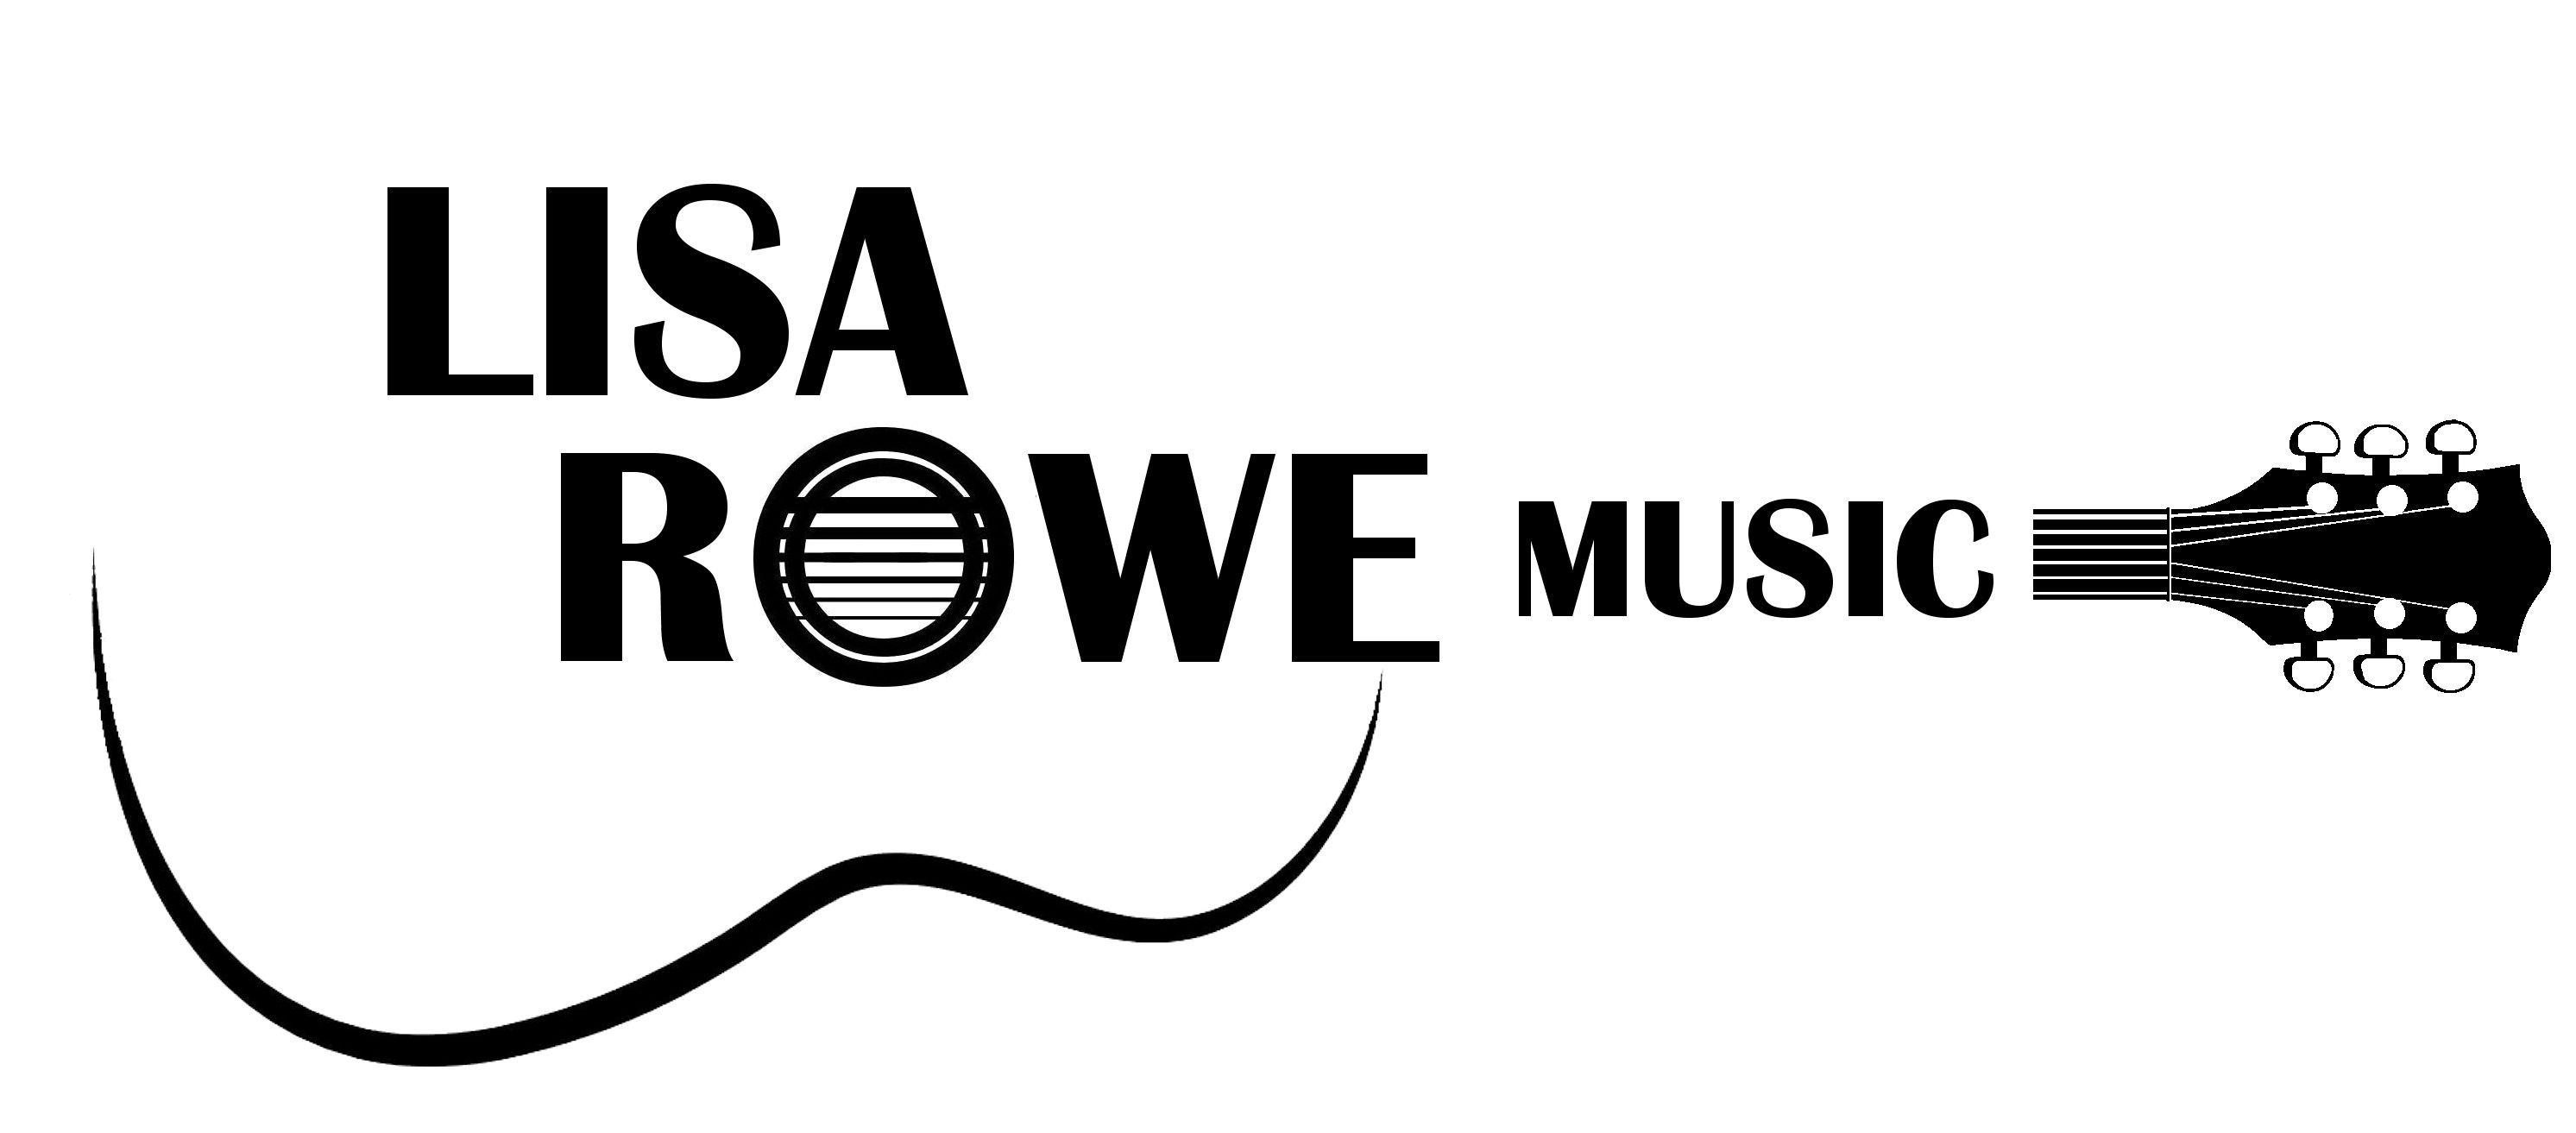 Lisa Rowe Music